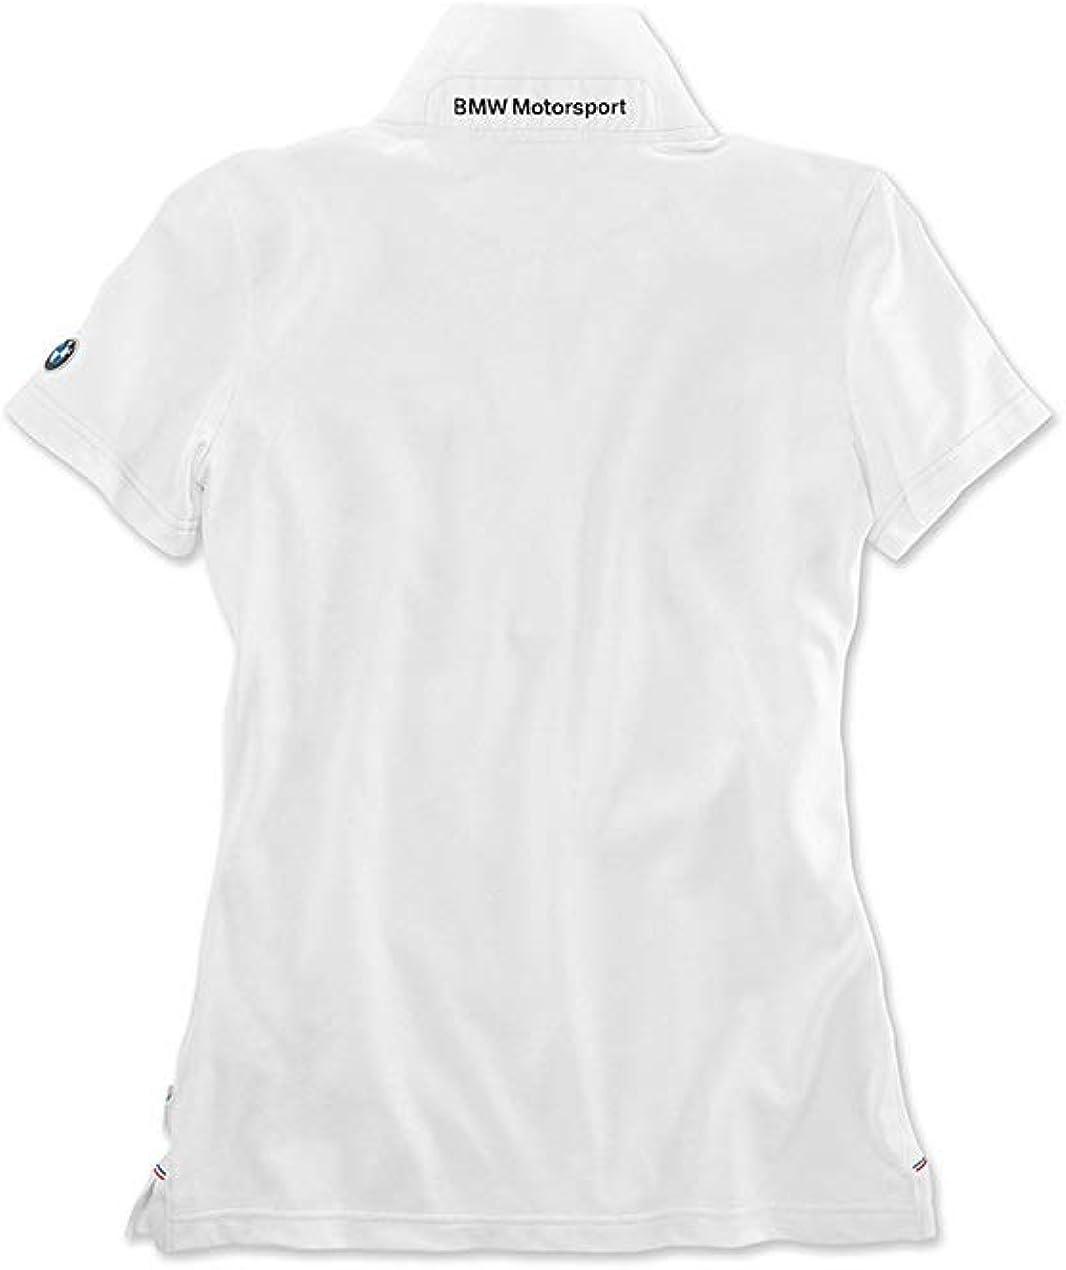 BMW Genuine Motorsport Ladies Womens Casual Short Sleeve Polo Shirt Tee Top